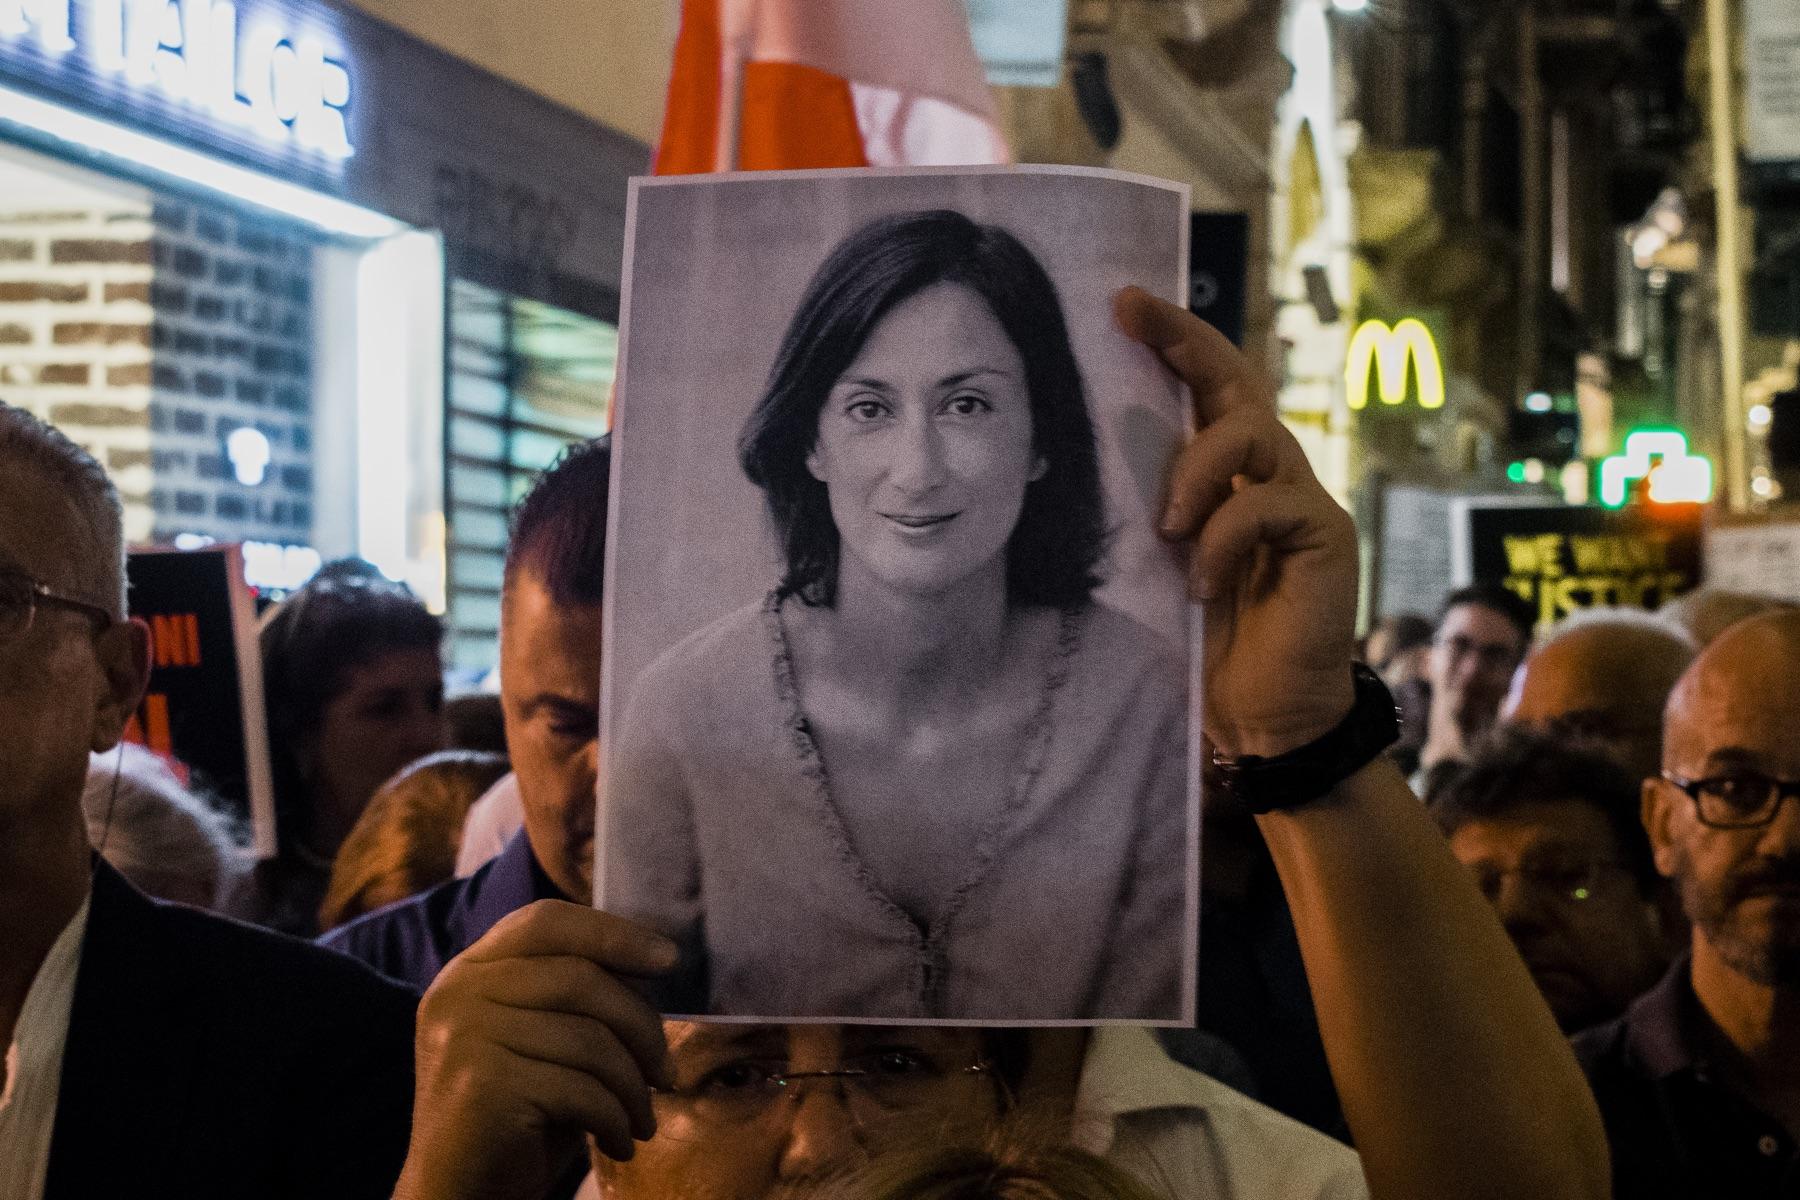 Daphne Caruana Galizia refuses to testify at magisterial